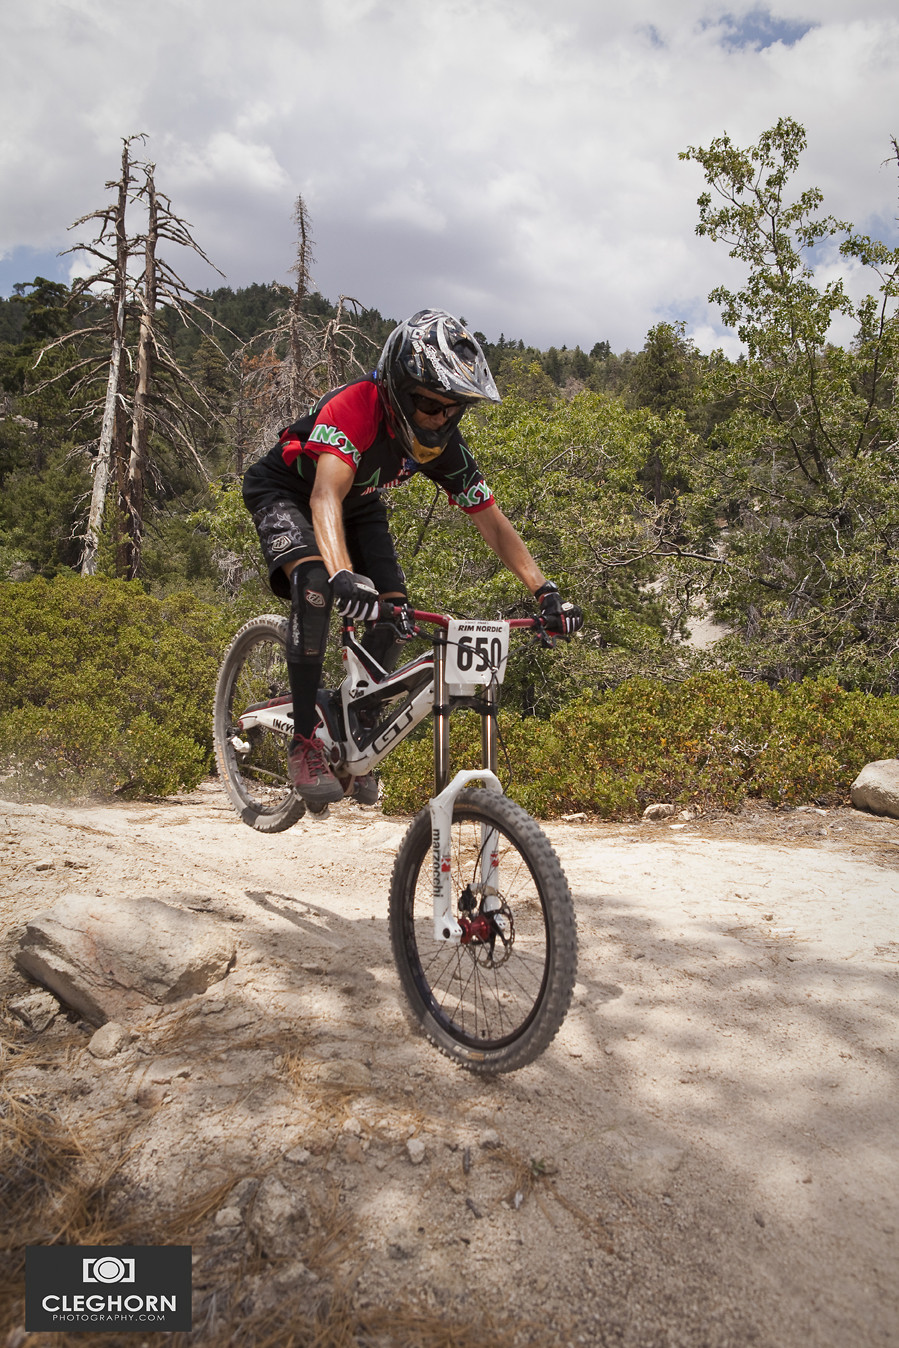 MG 0516 - Cleghorn Photography - Mountain Biking Pictures - Vital MTB